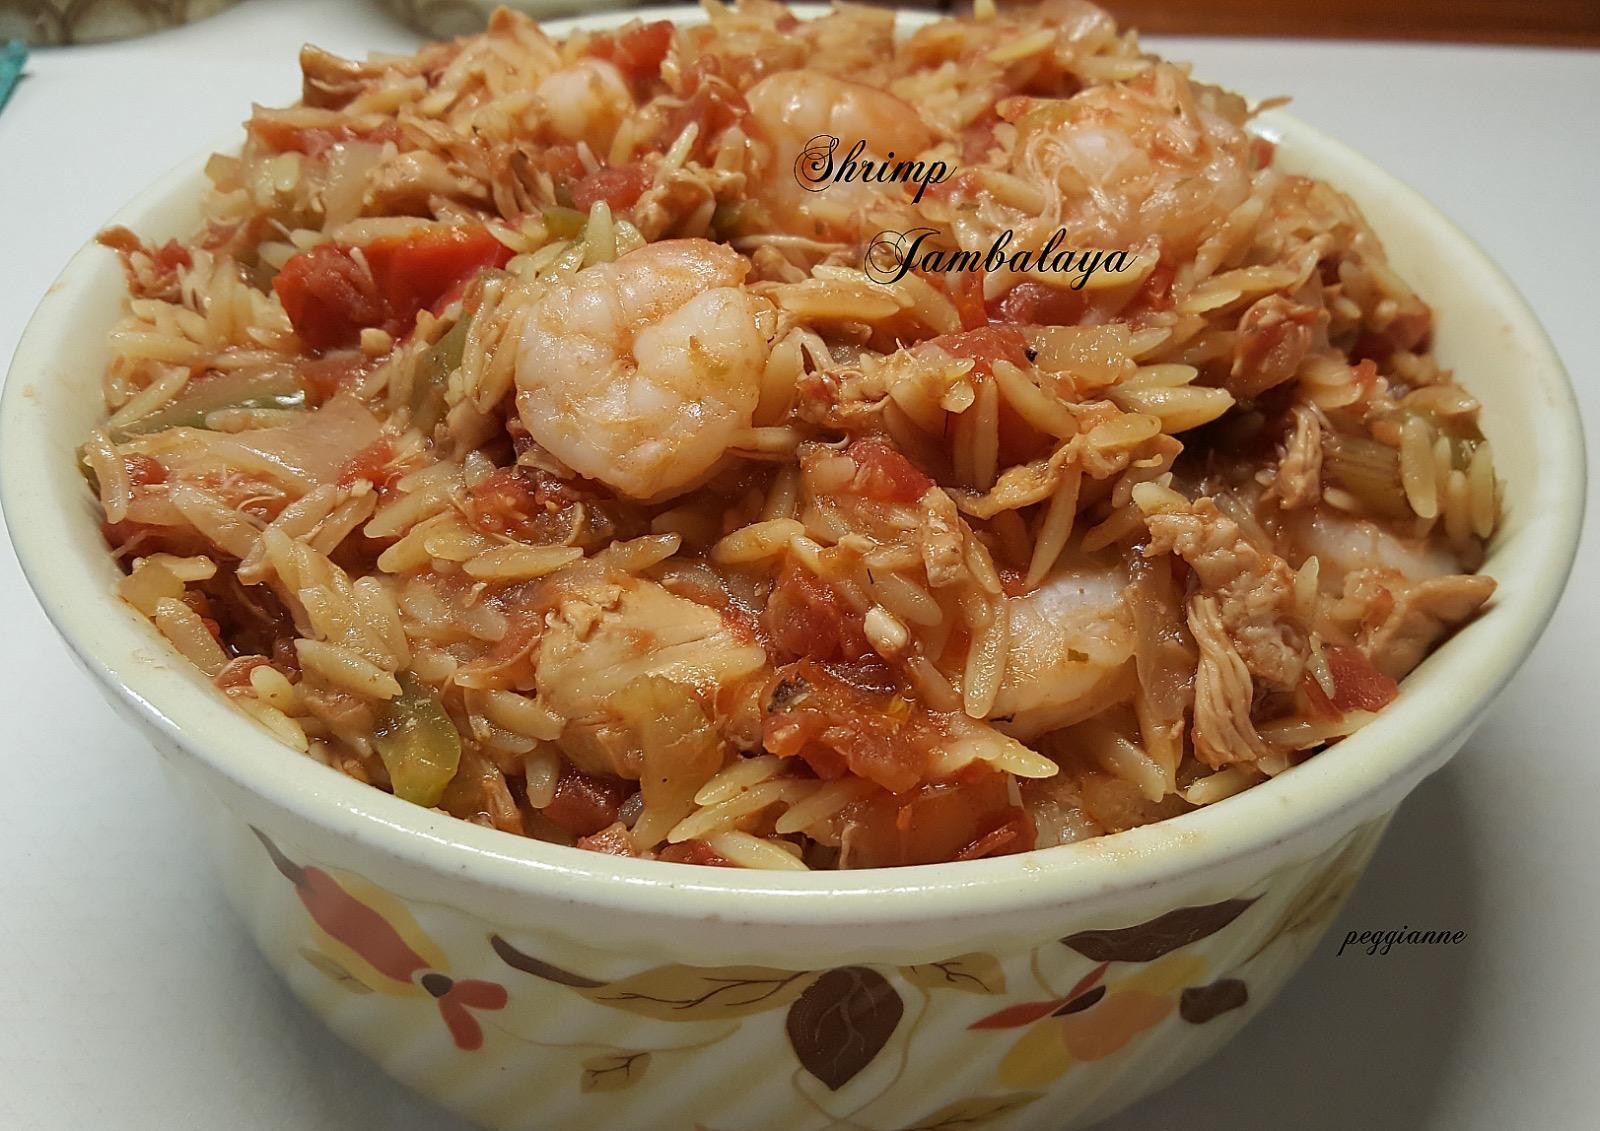 Shrimp Jambalaya Peggianne